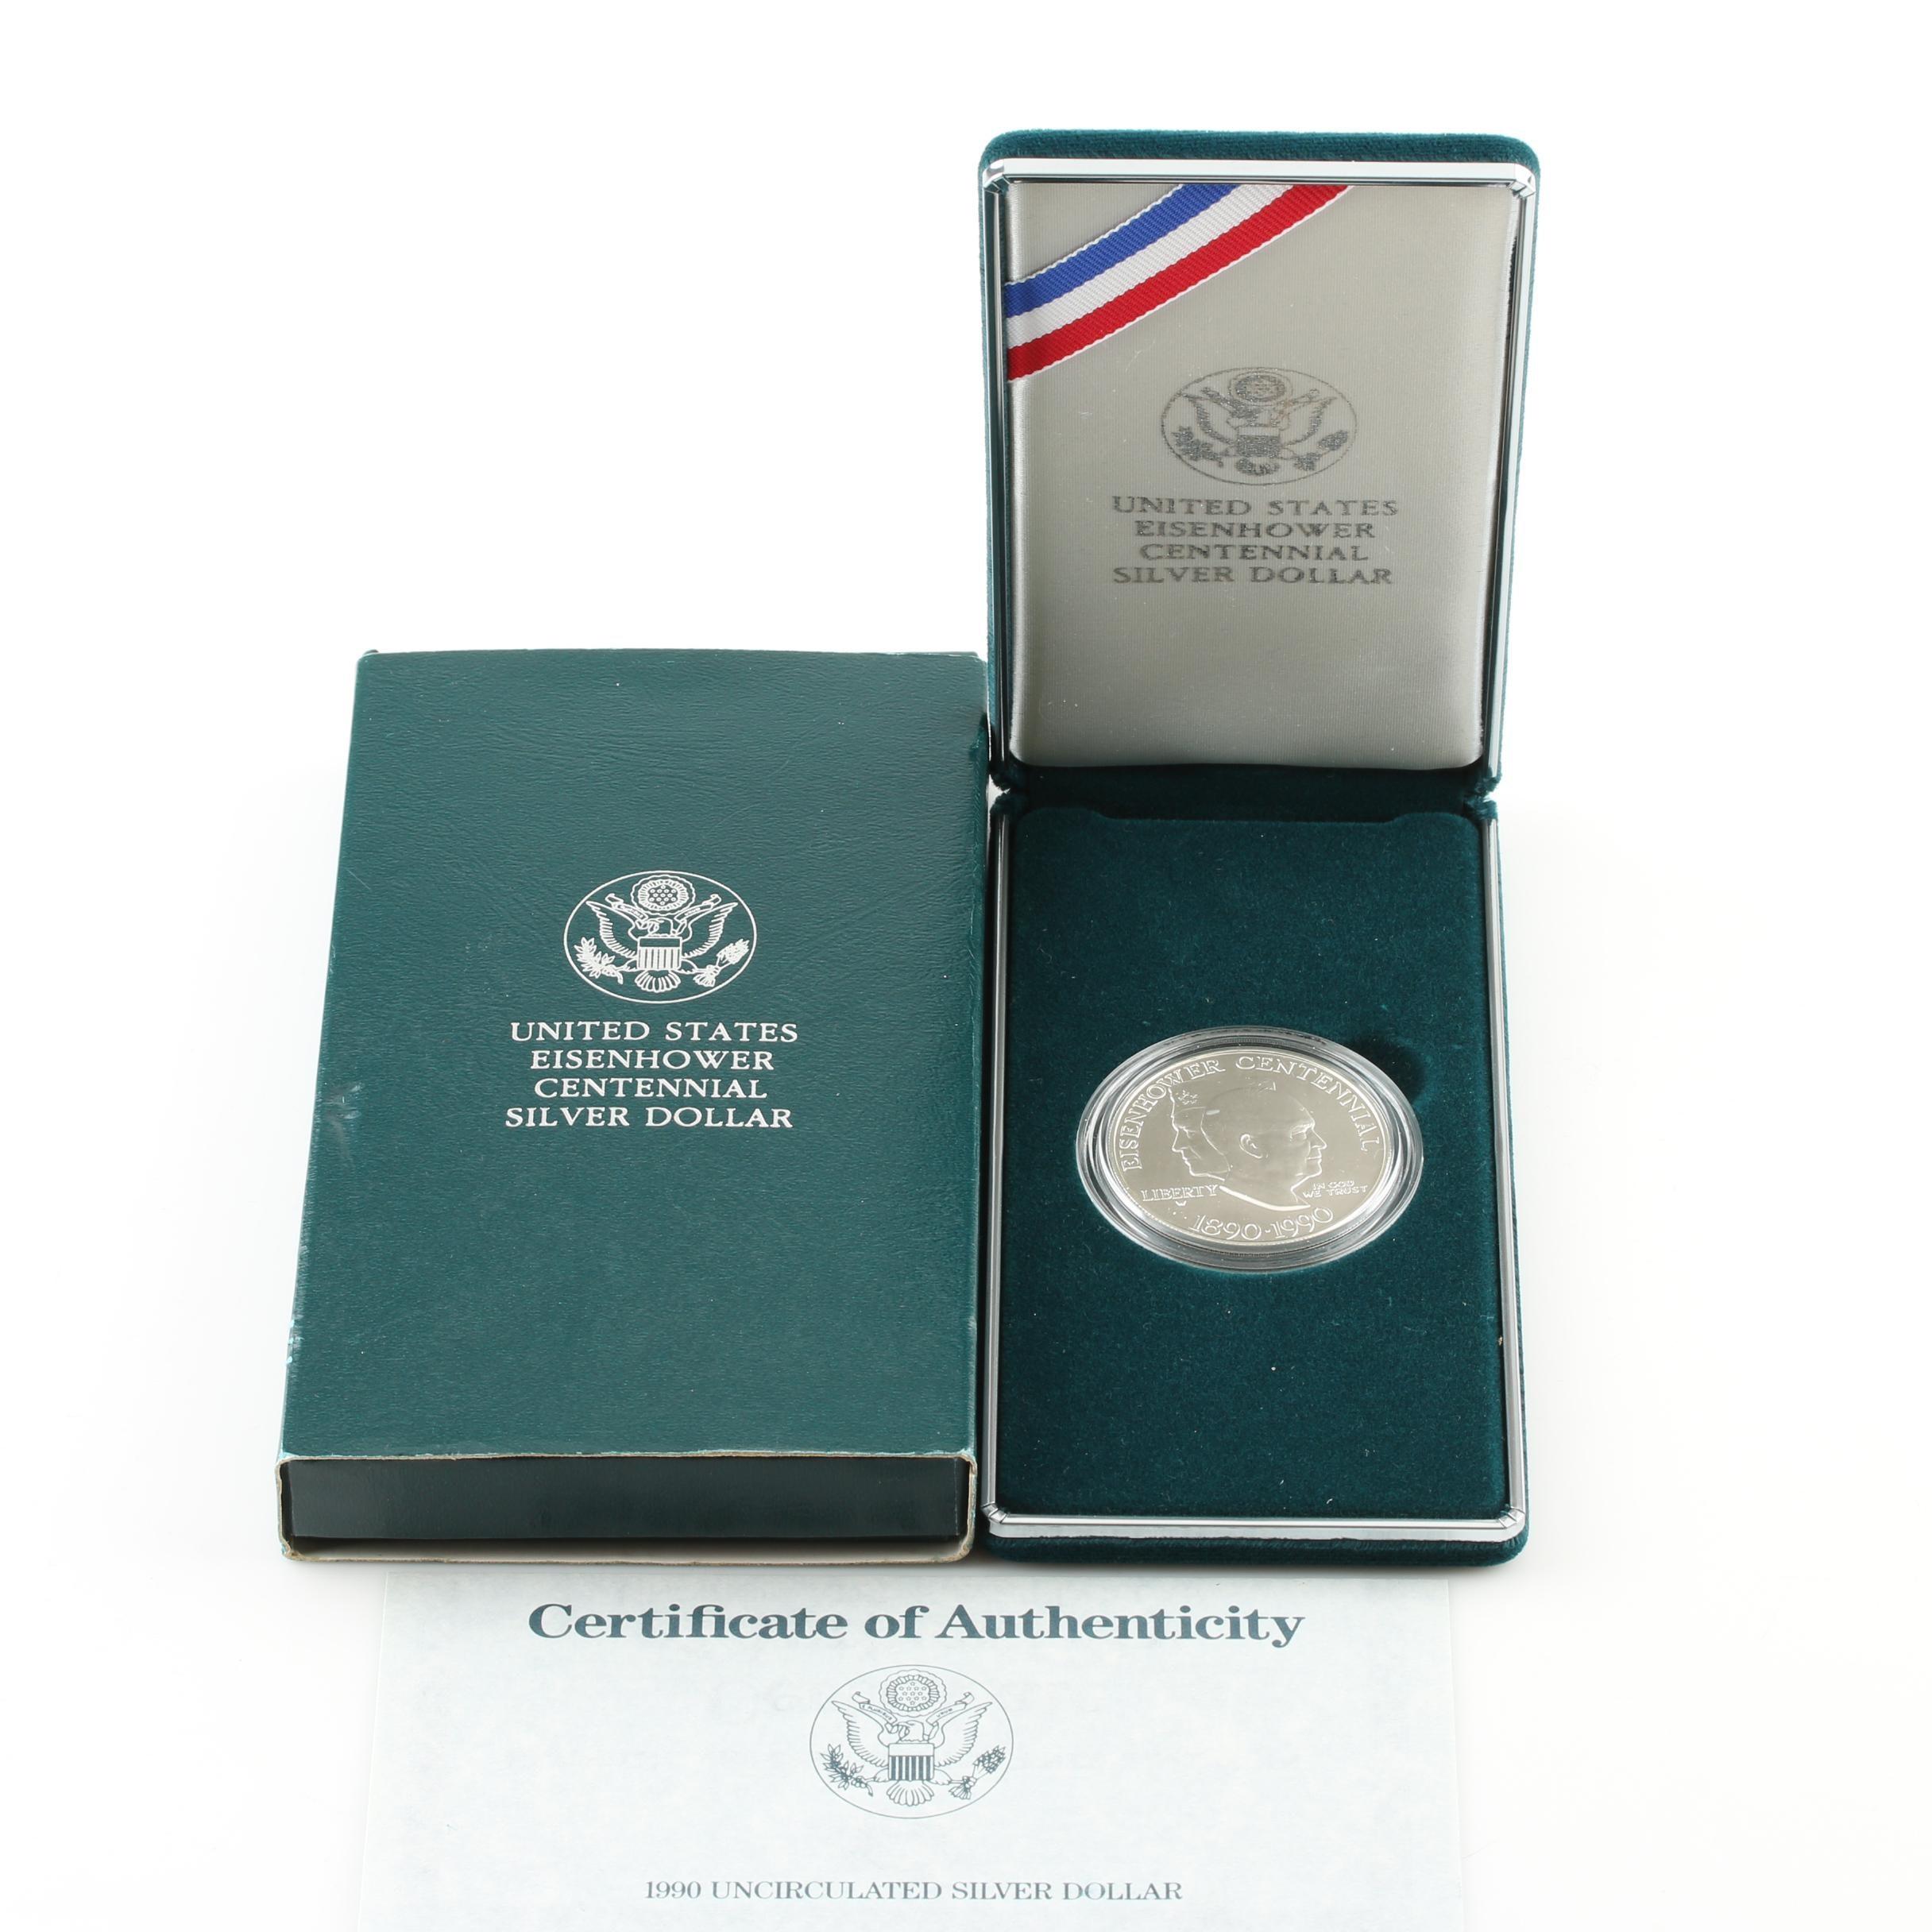 1990-W Eisenhower Centennial One Dollar Silver Coin